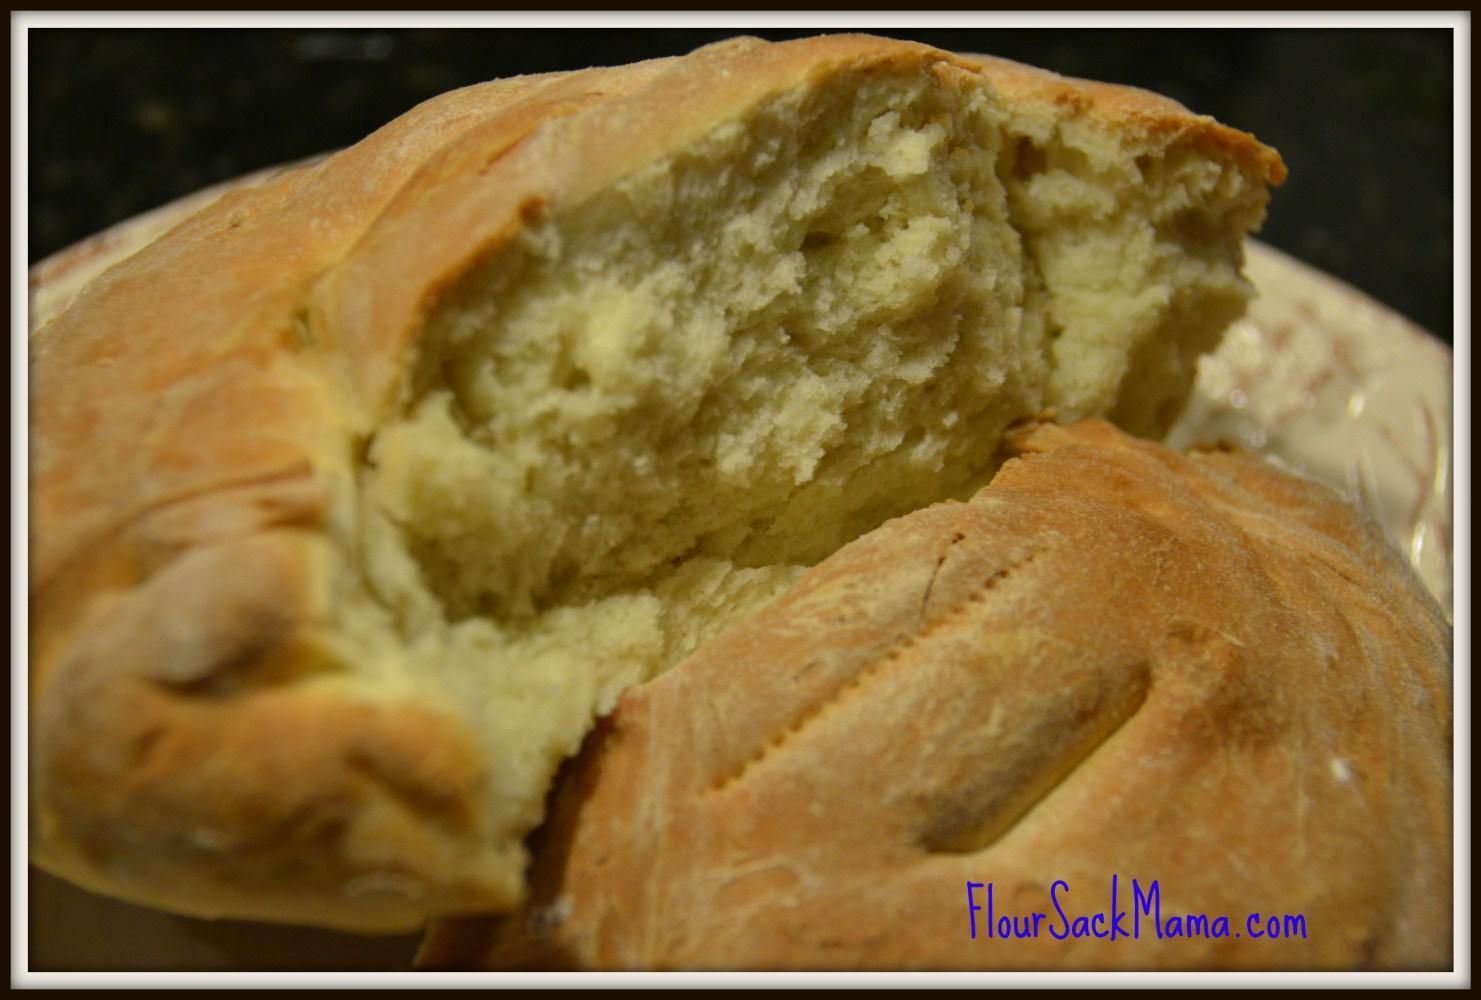 BreadBakedFlourSackMama